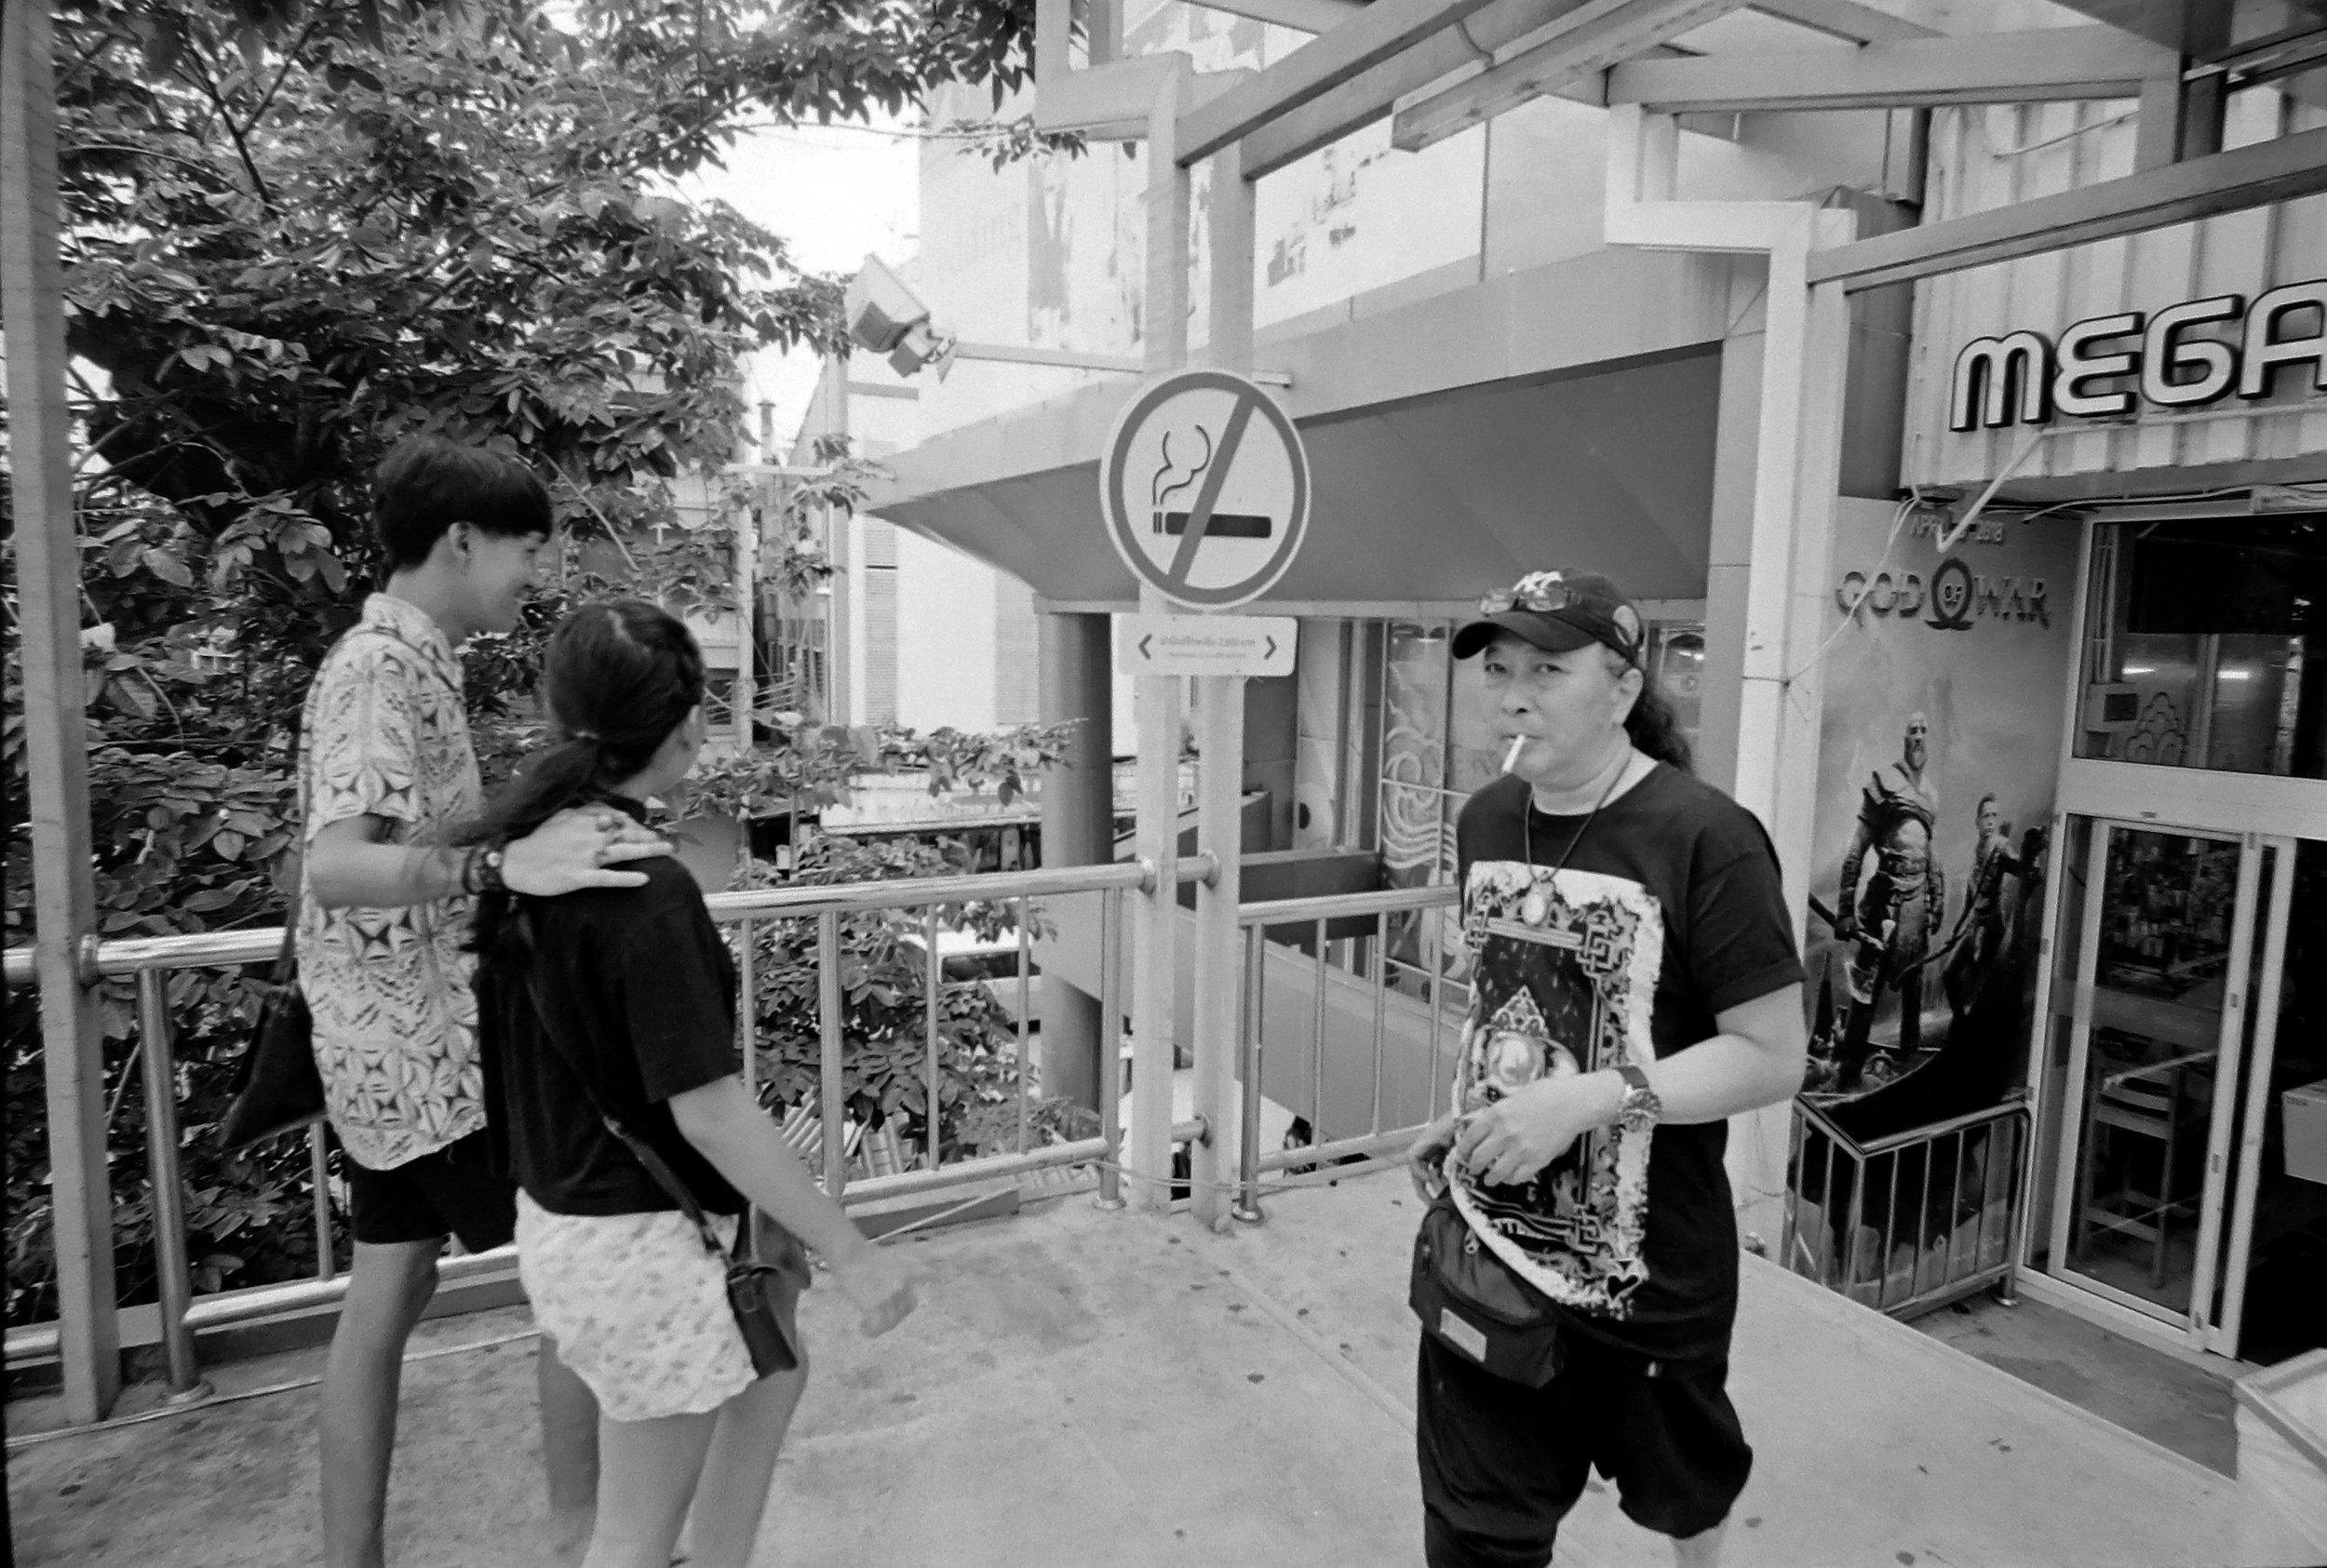 Chromacomaphoto Streetphotography Bangkok Thailand Leica 21mm super angulon sa 3 4 kodak tri x film (2).JPG